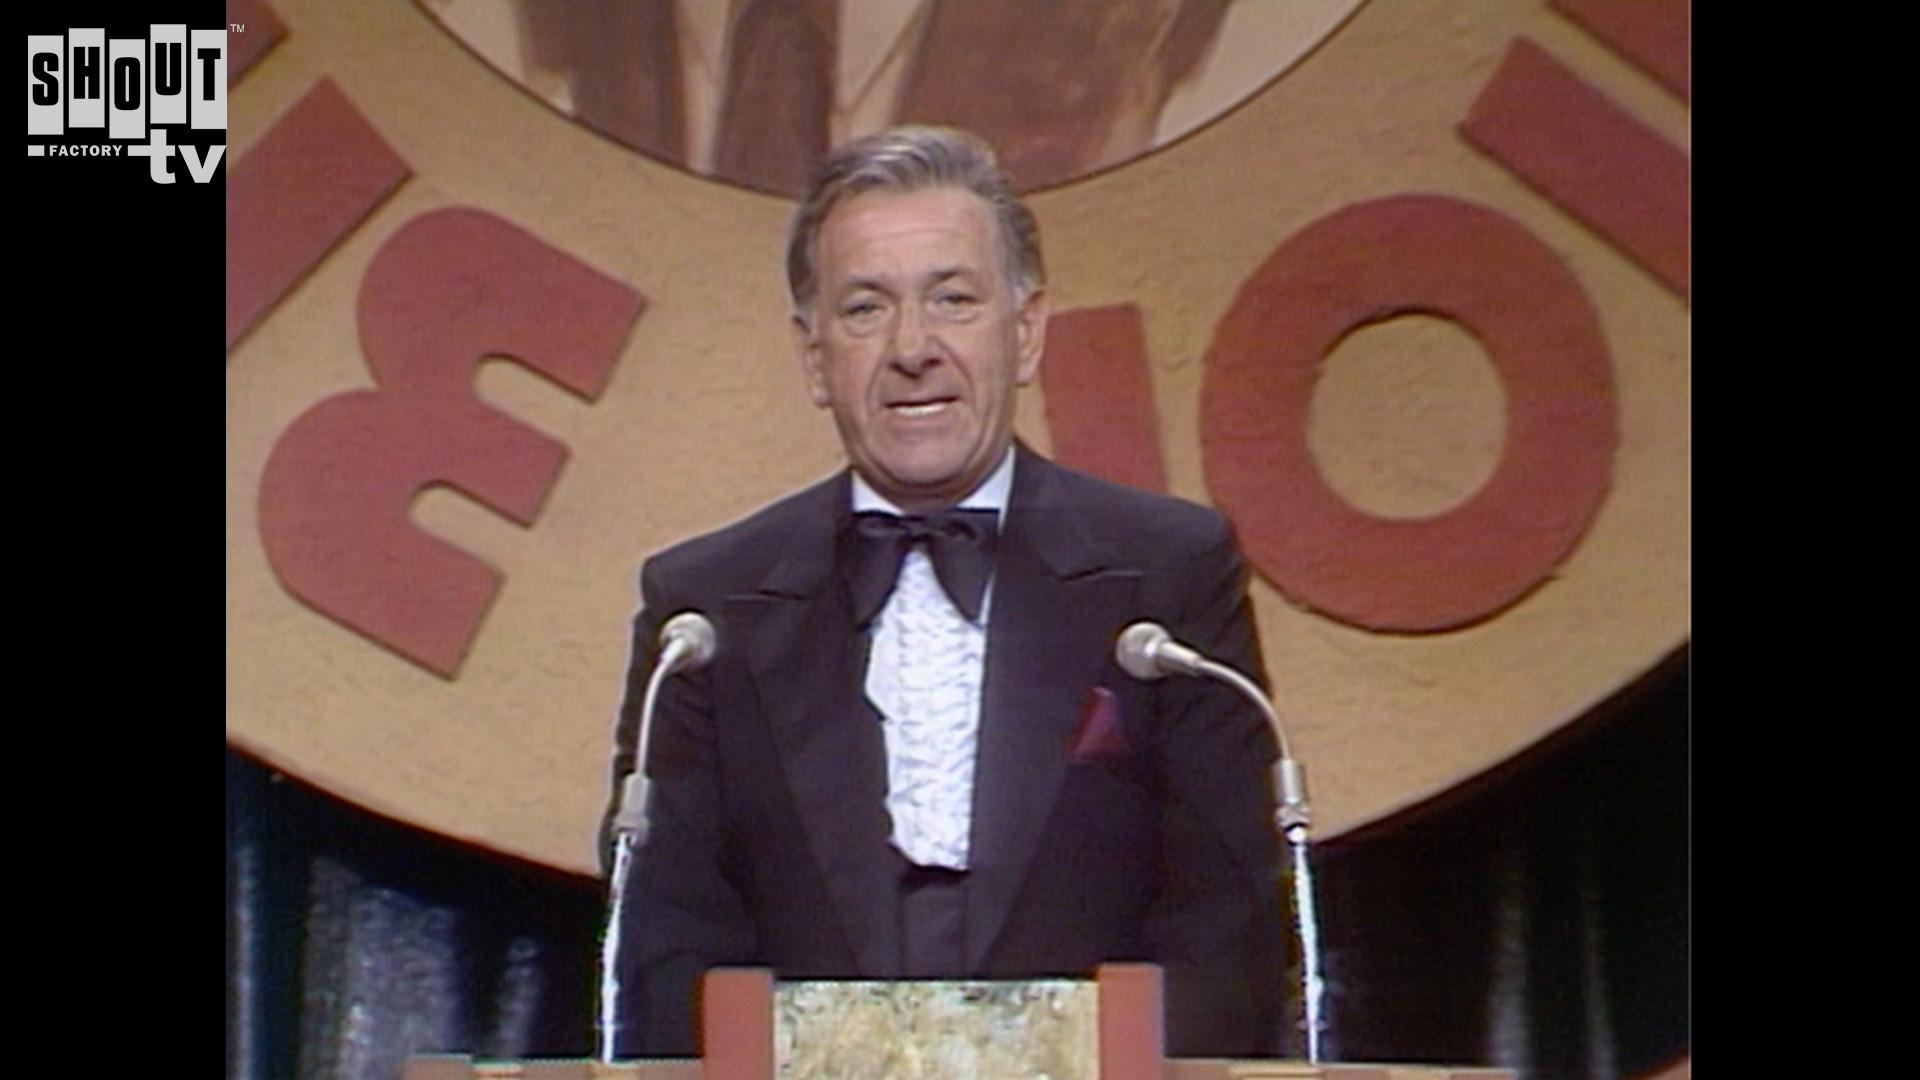 The Dean Martin Celebrity Roasts: Jack Klugman (3/17/78)